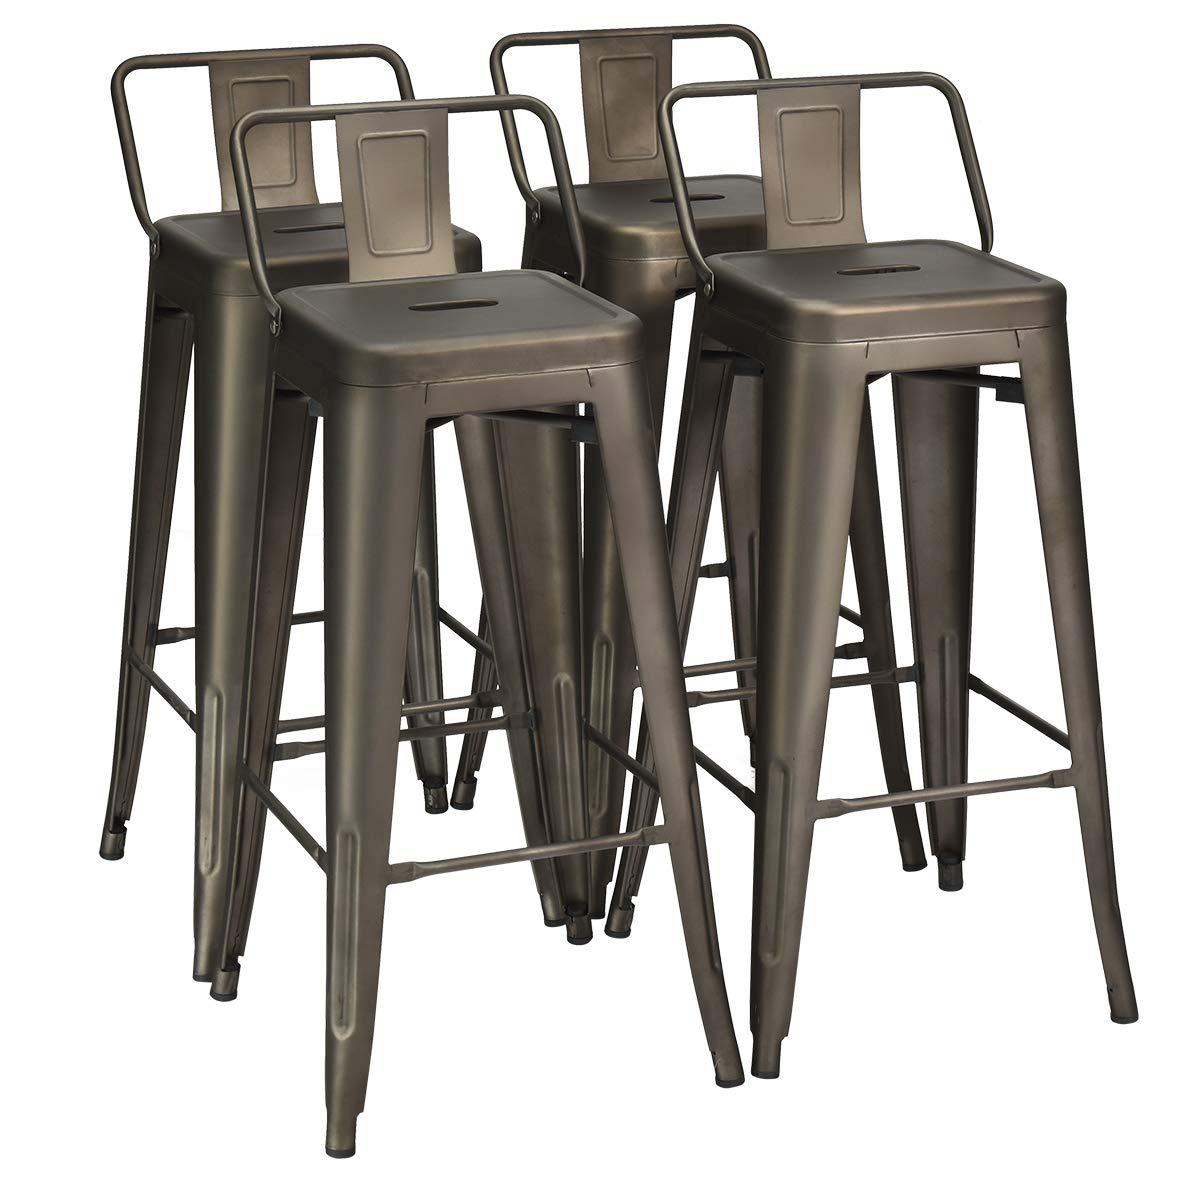 PBQU5-OAK-W 5 PC counter height Dining set – counter height Table and 4 counter height stool.